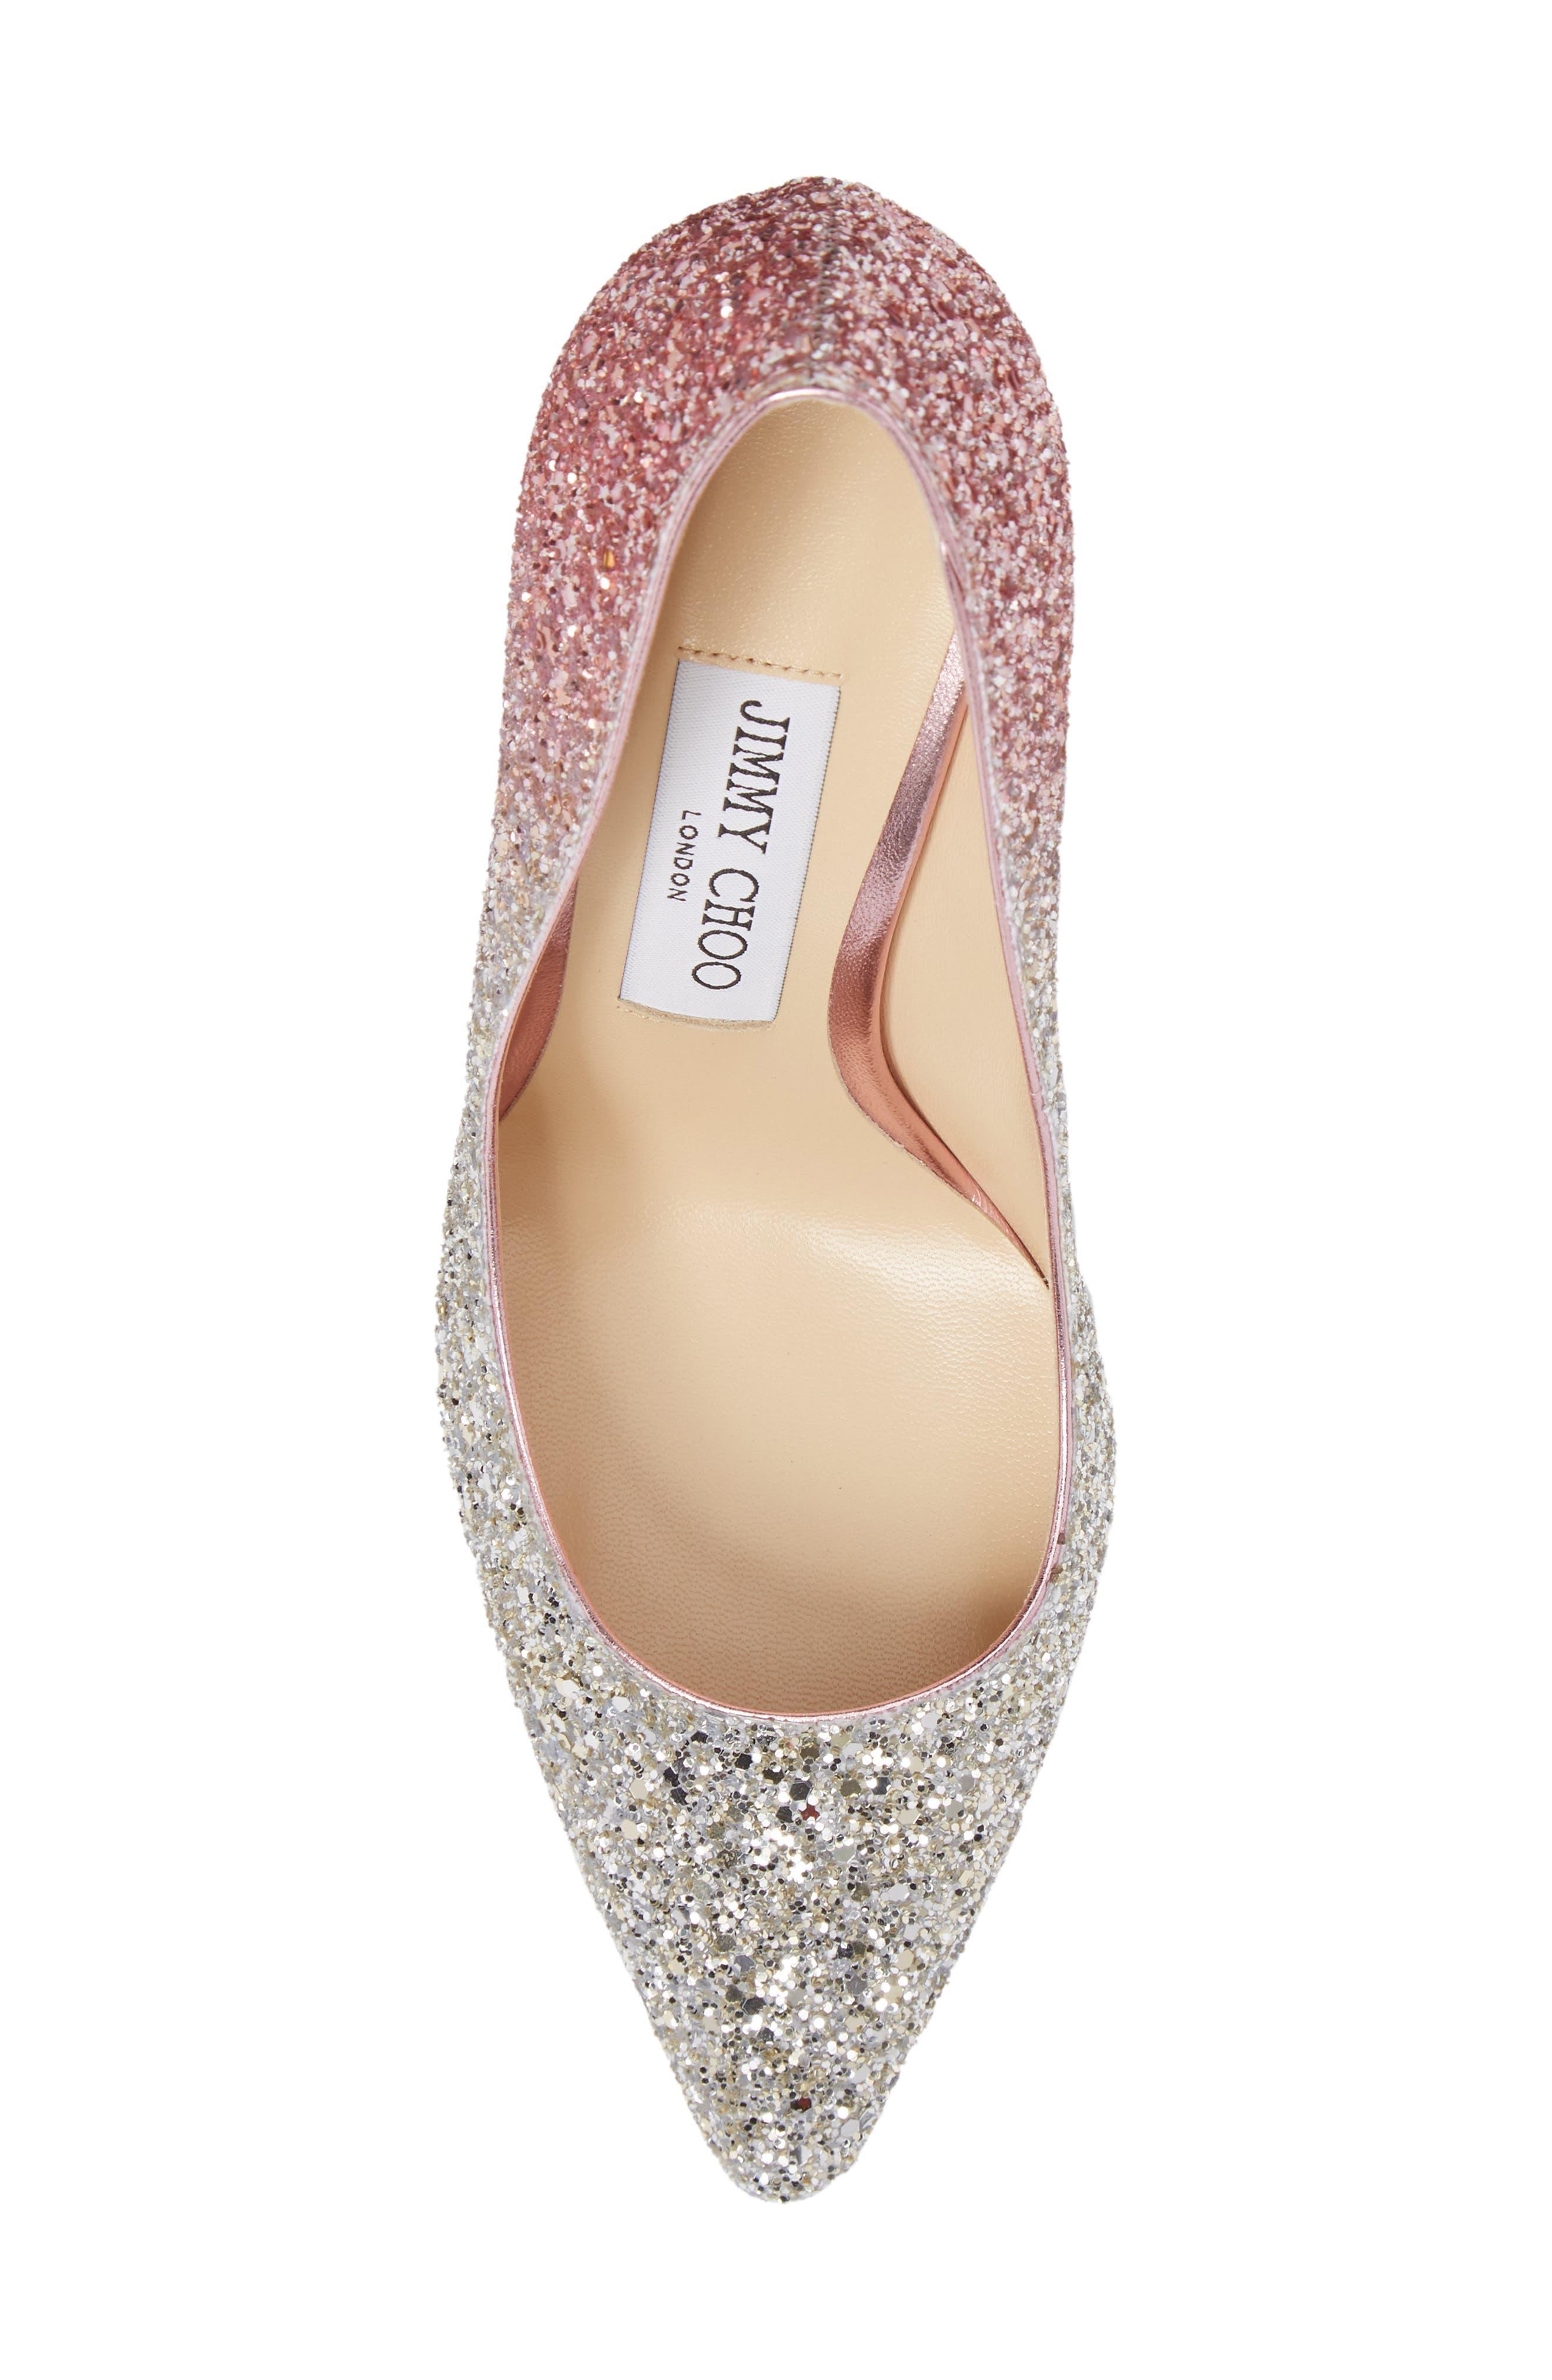 'Romy' Pointy Toe Pump,                             Alternate thumbnail 5, color,                             Platinum/ Flamingo Pink